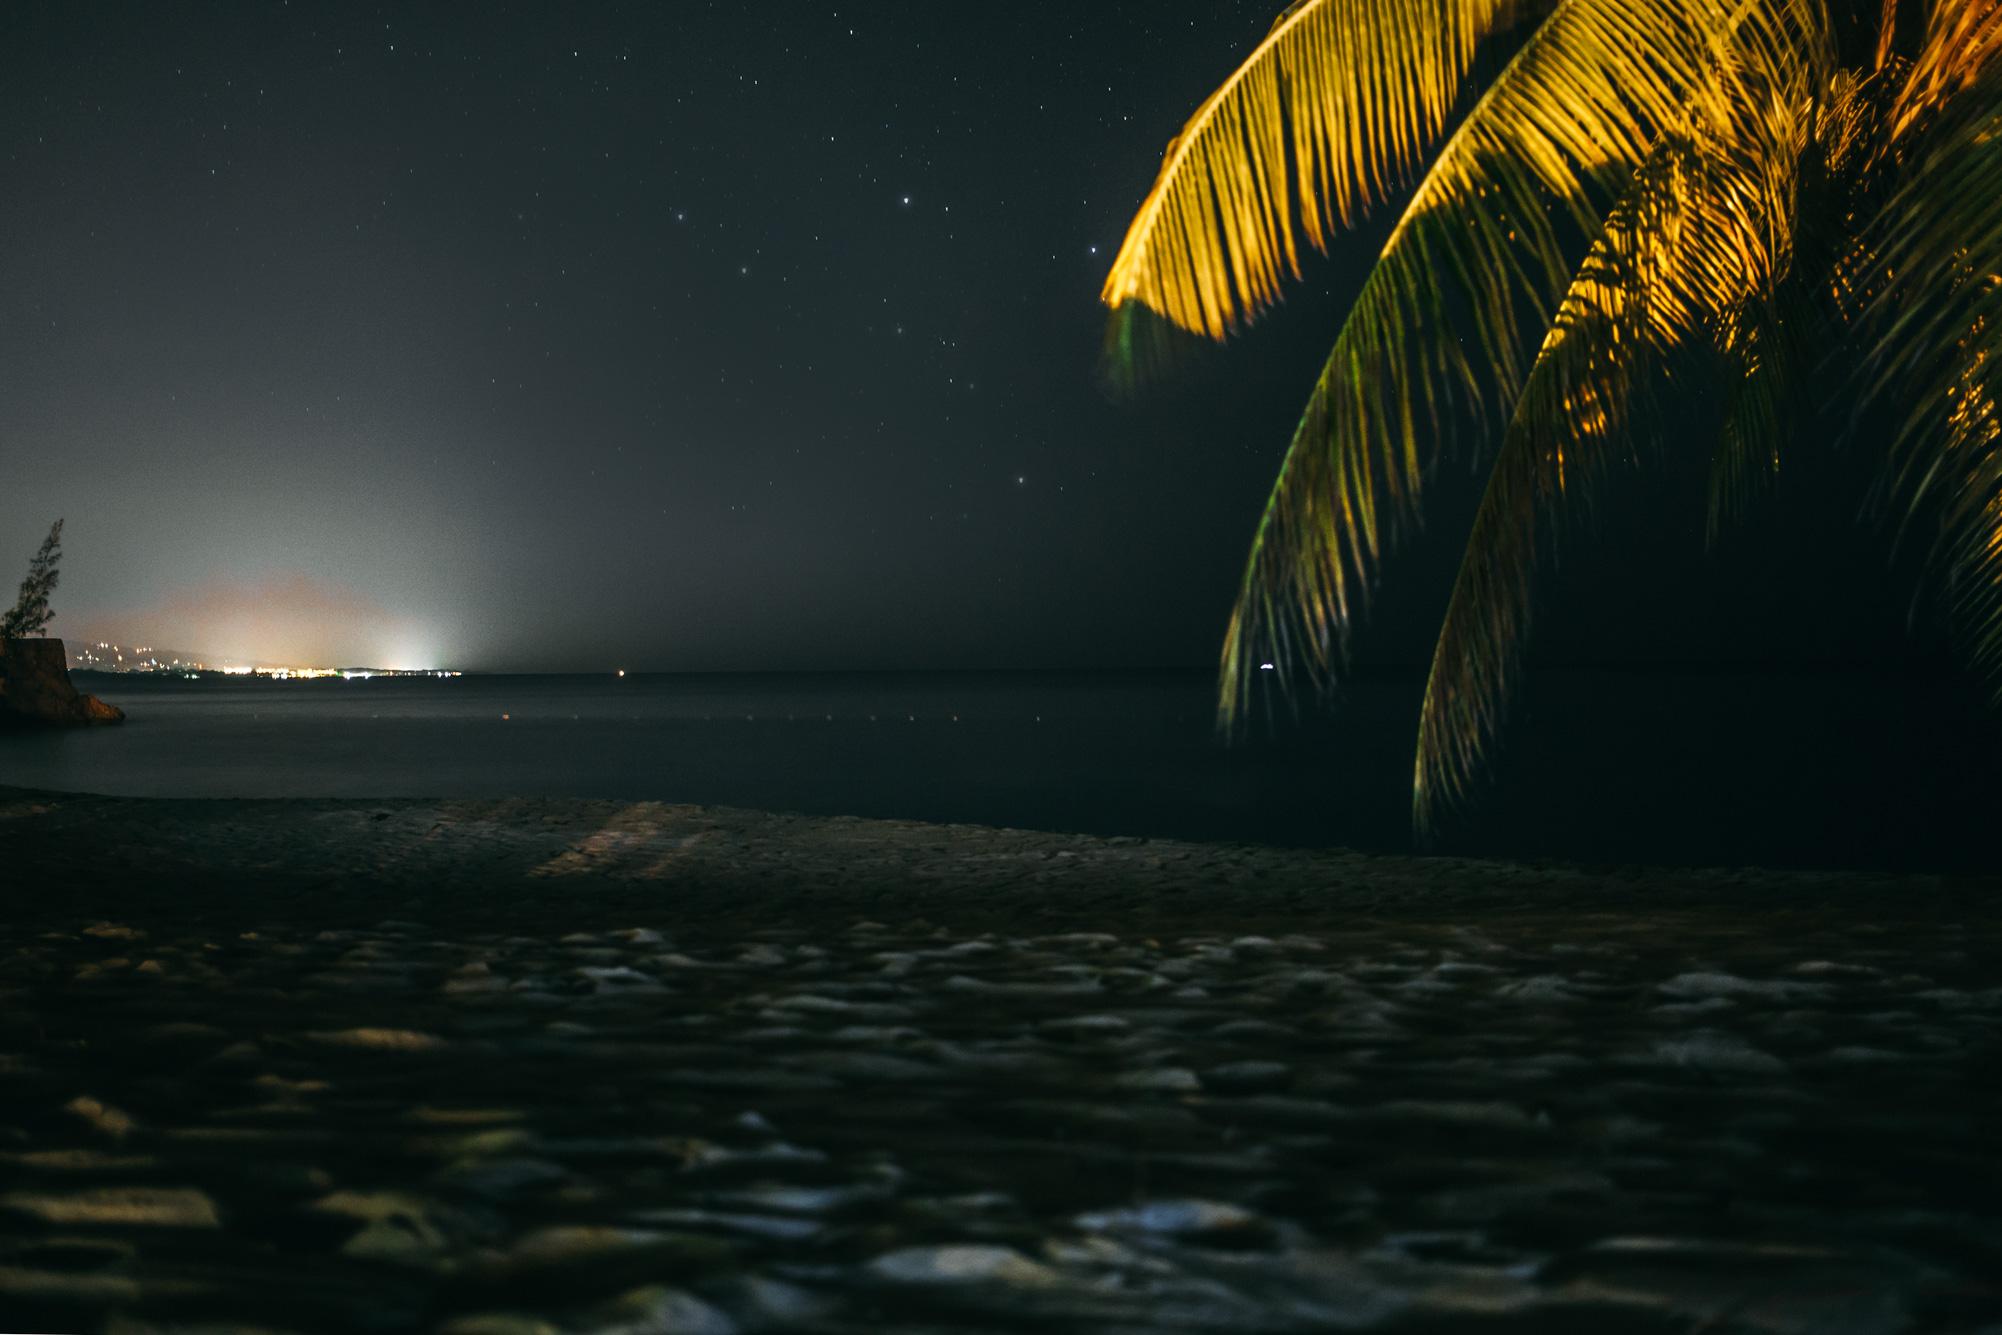 nightpalm